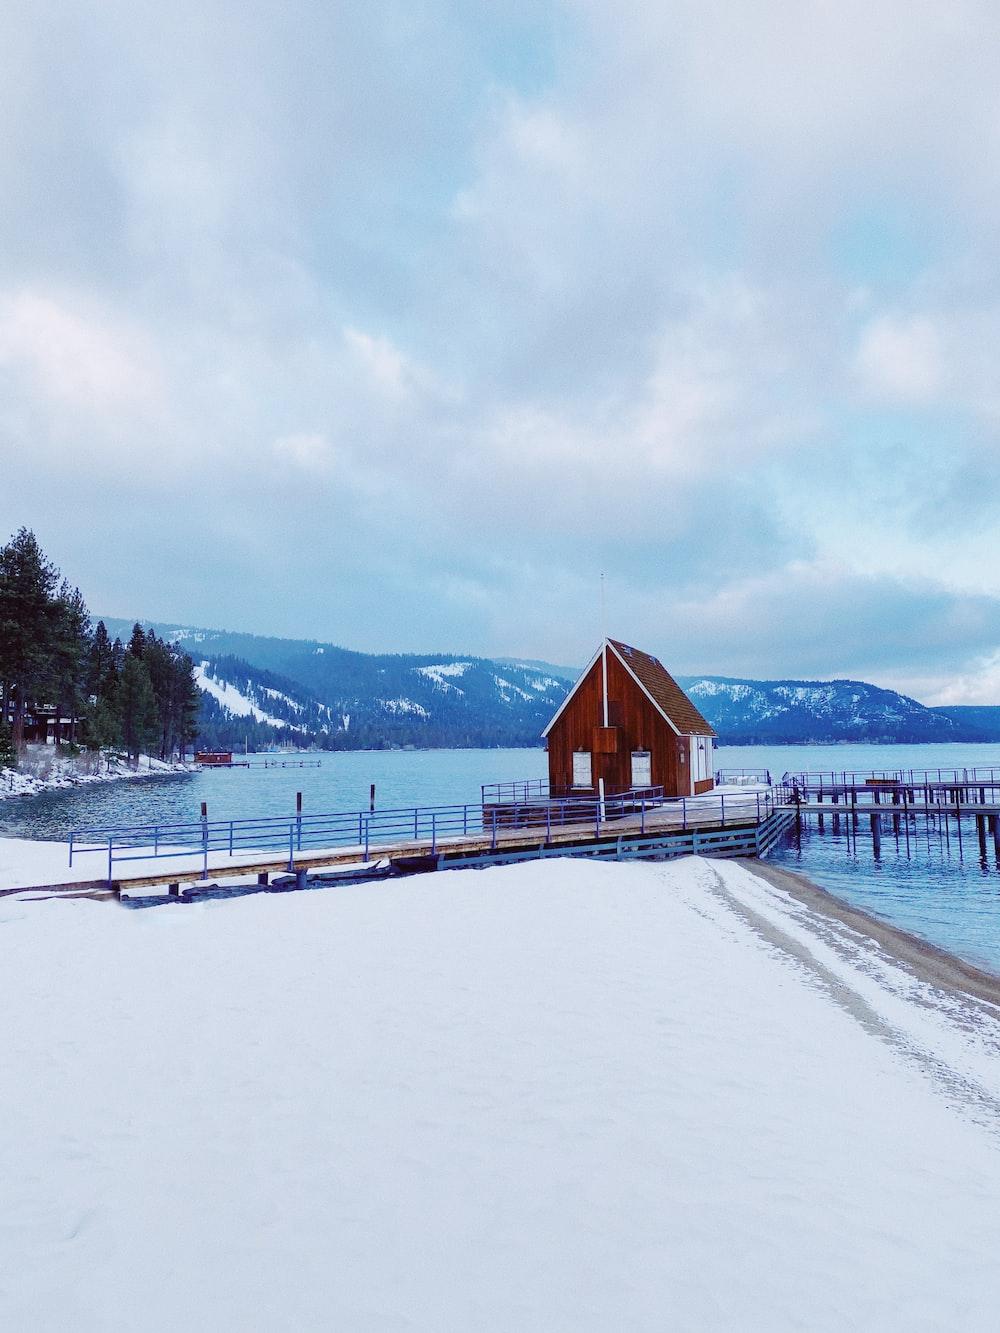 house on dock on lake